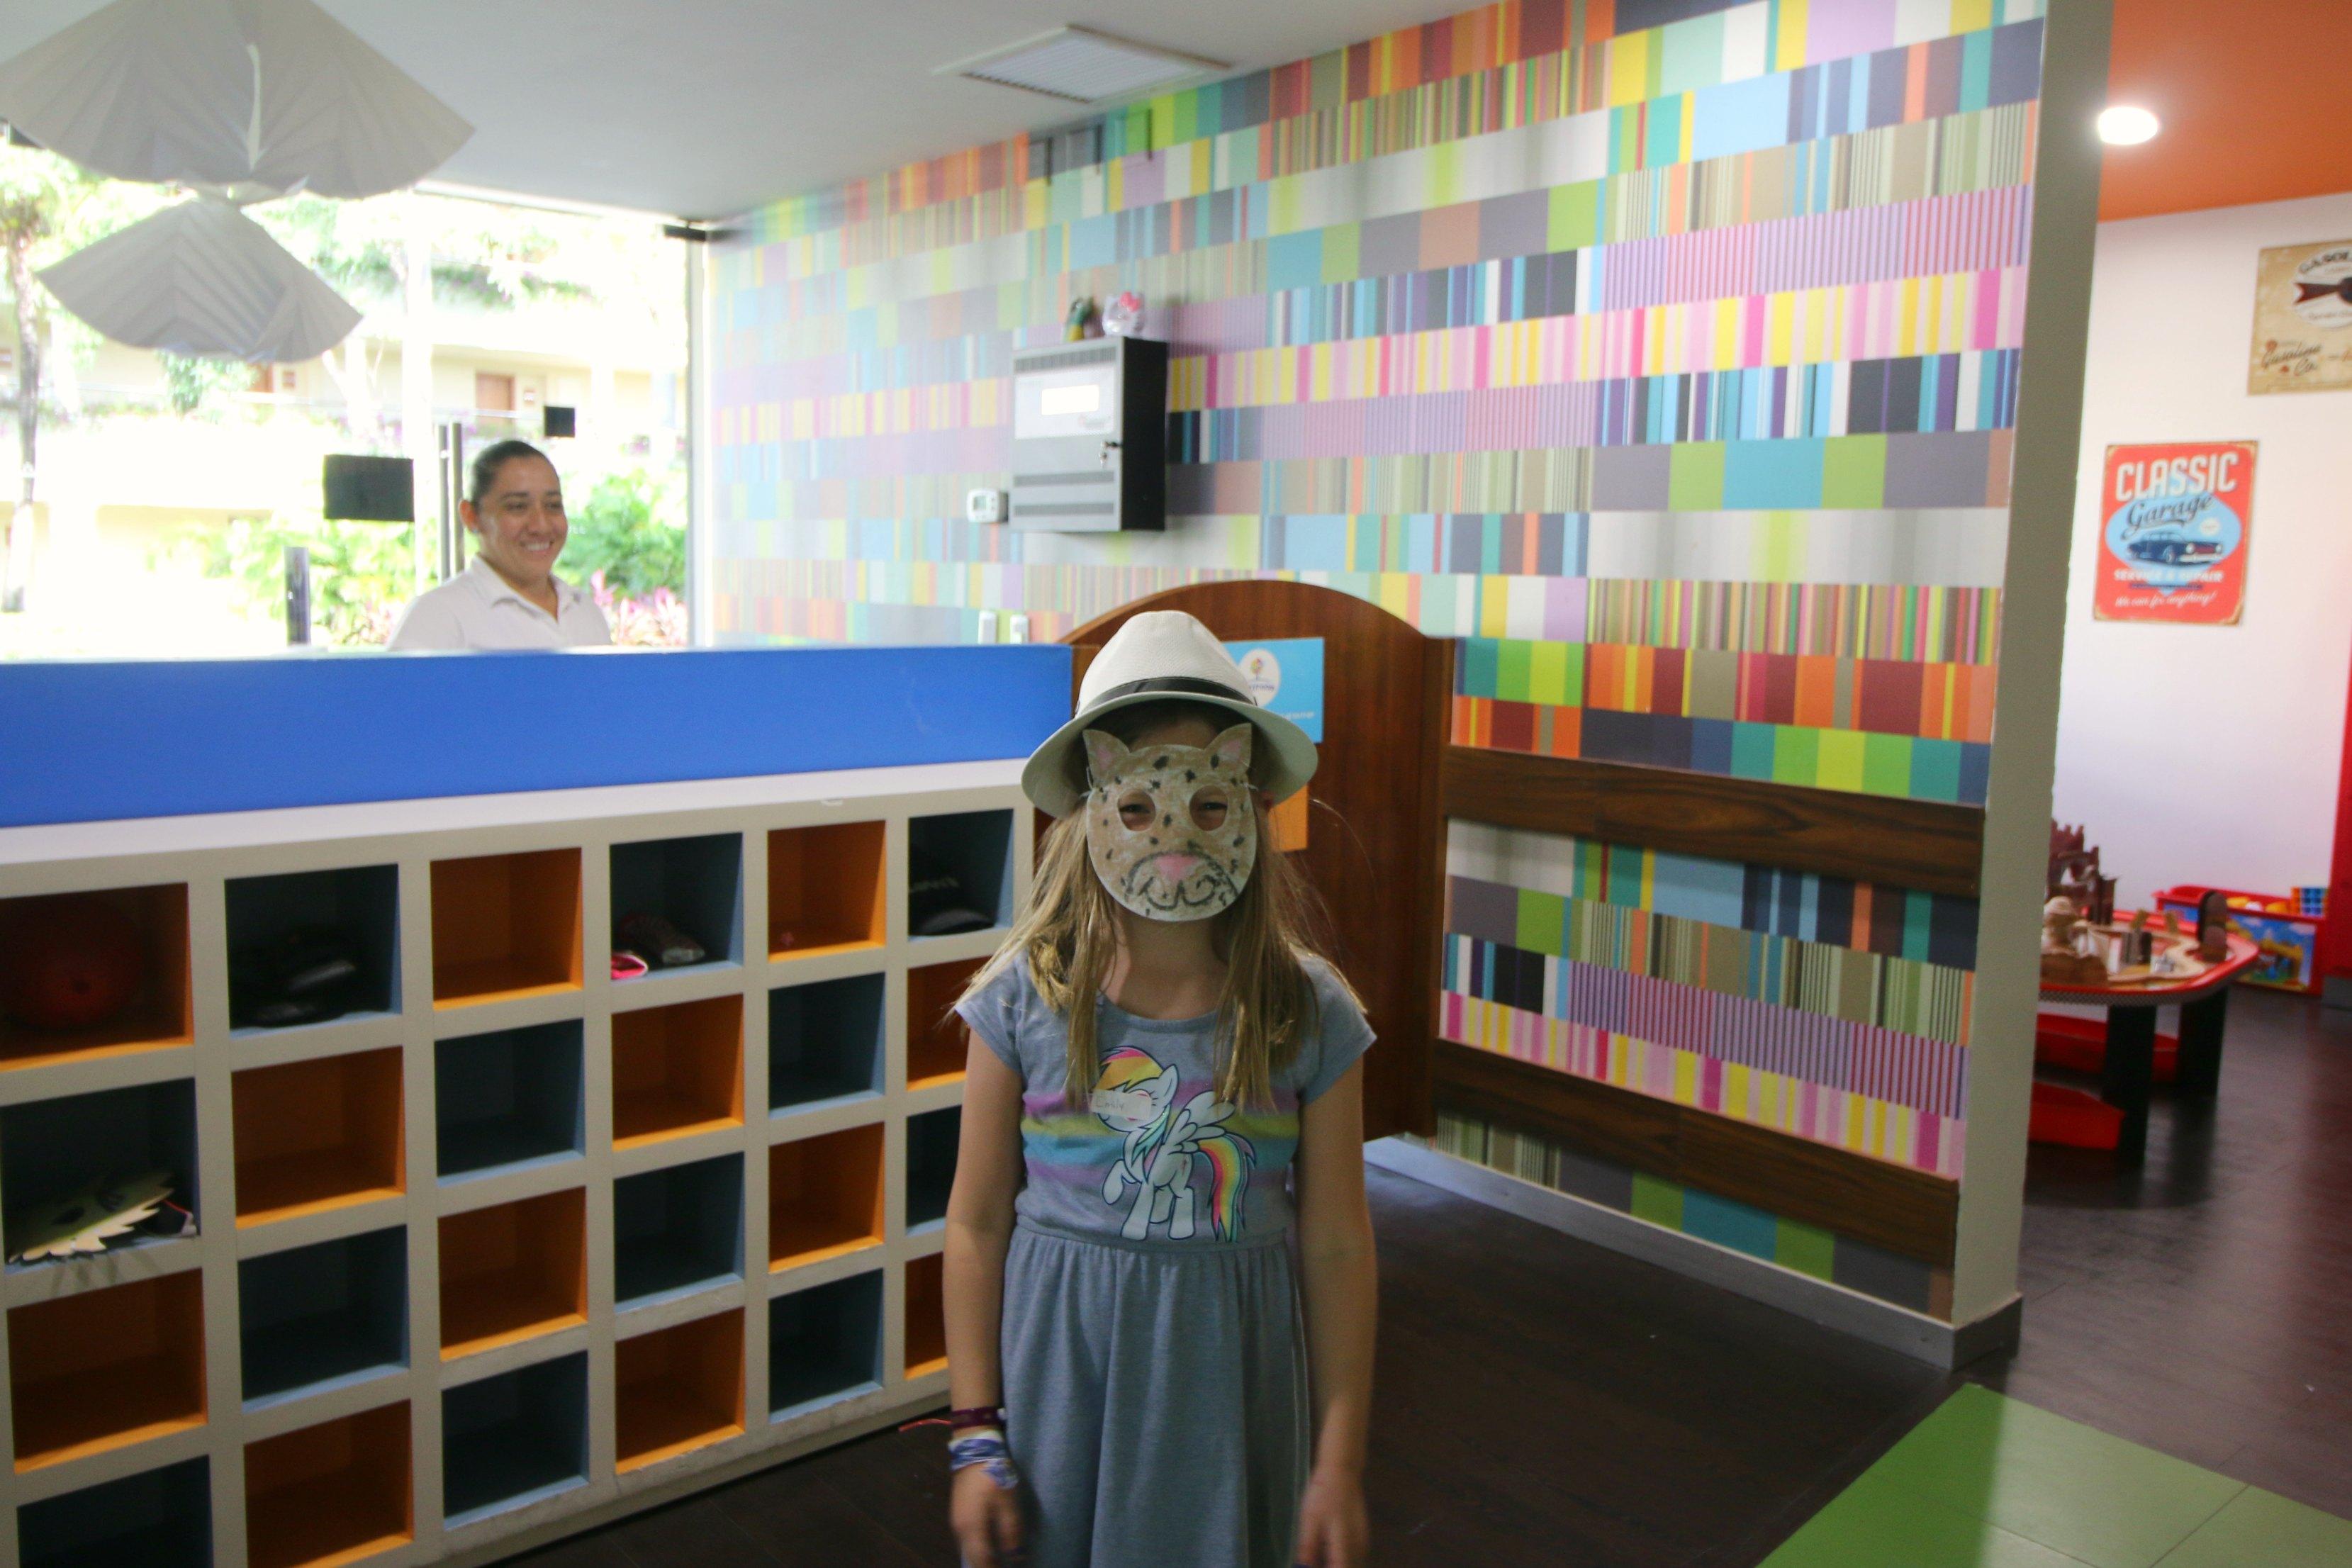 moon-palace-cancun-fun-for-kids